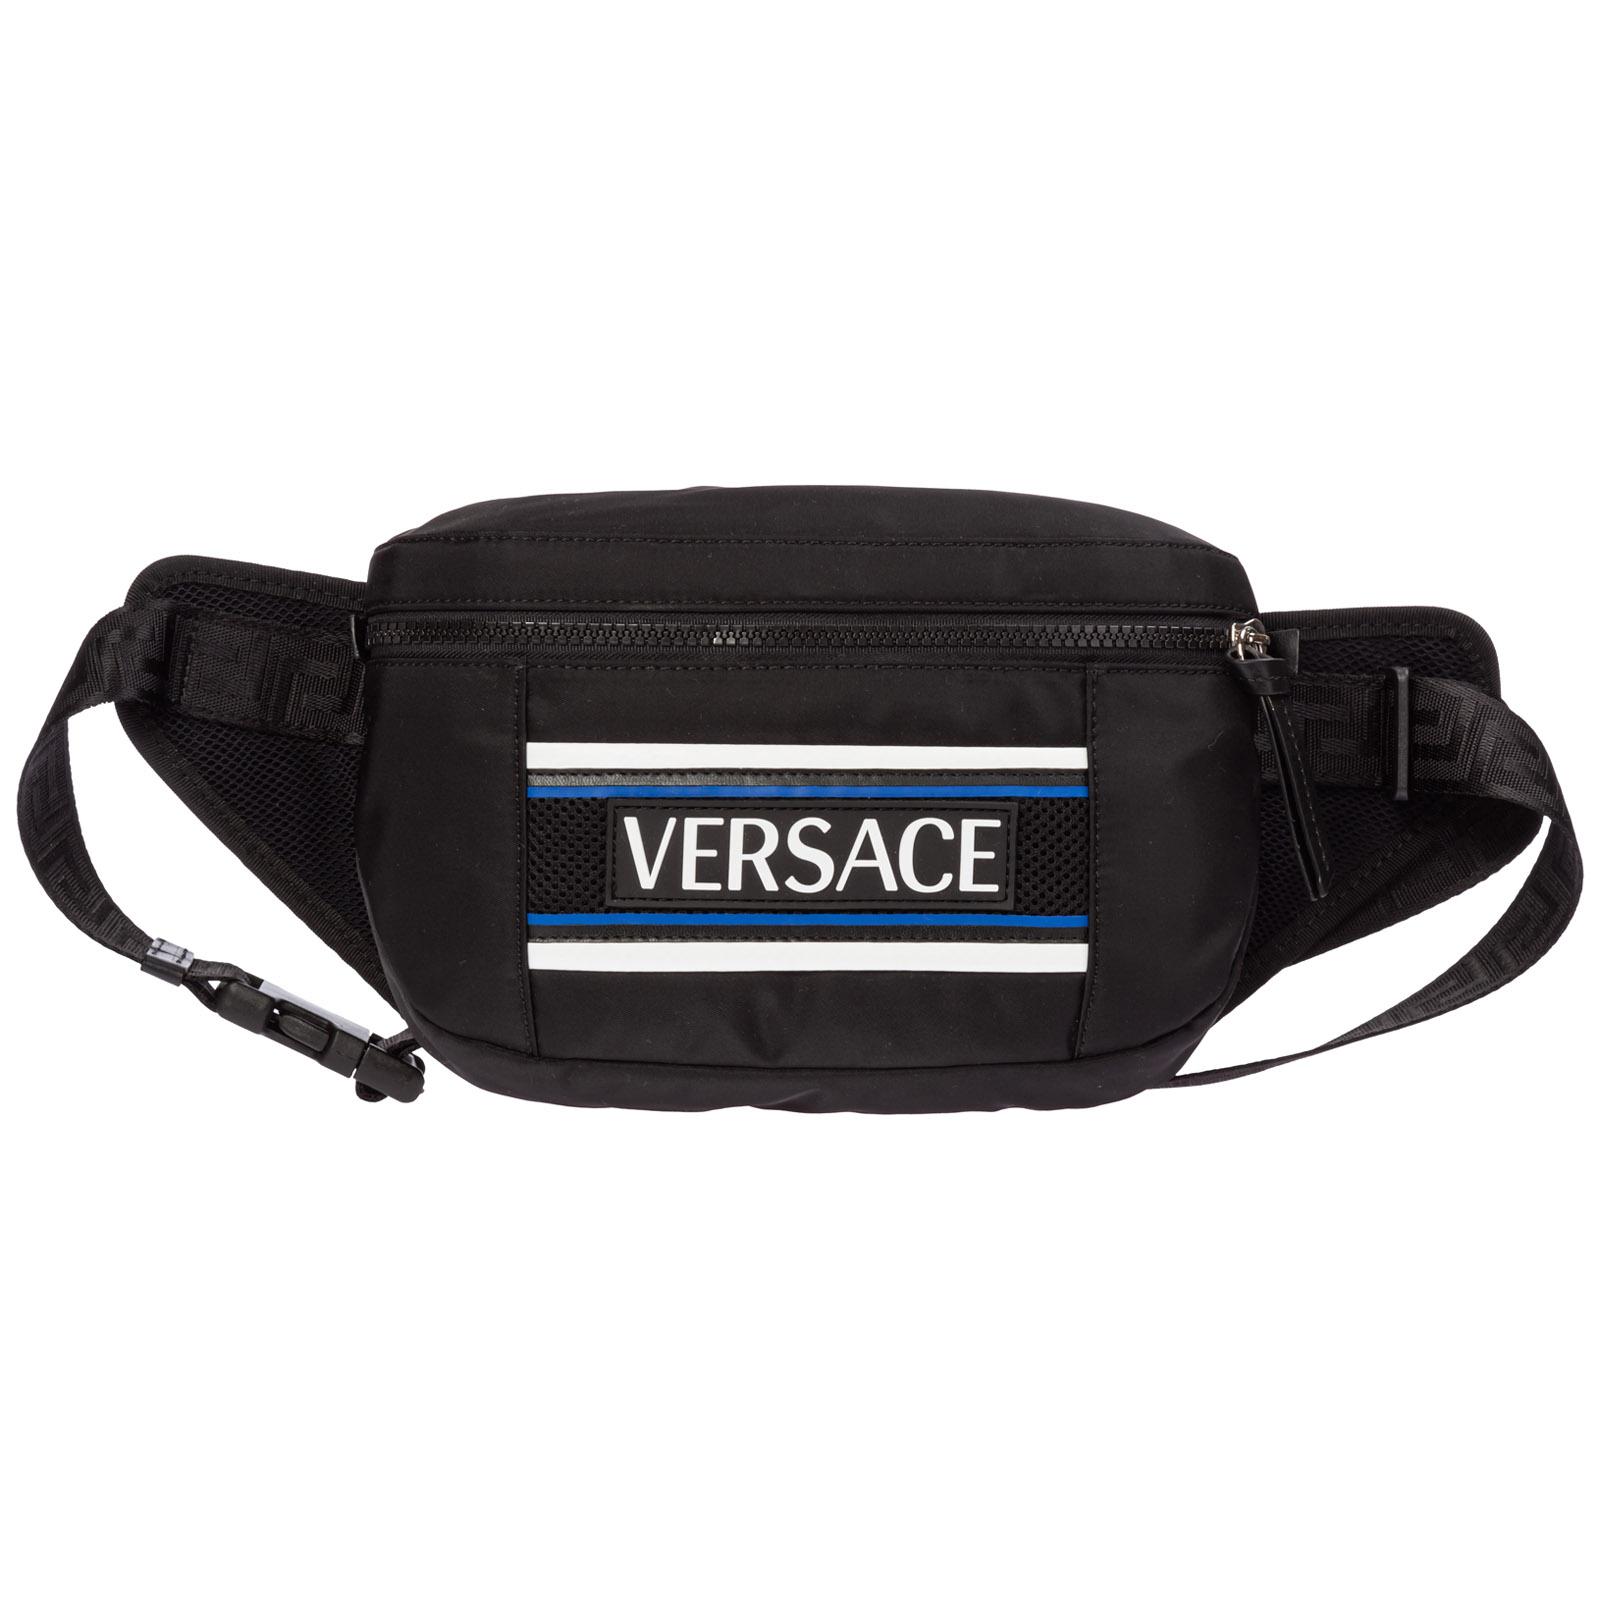 Versace Belt MEN'S BELT BUM BAG HIP POUCH  OLYMPUS